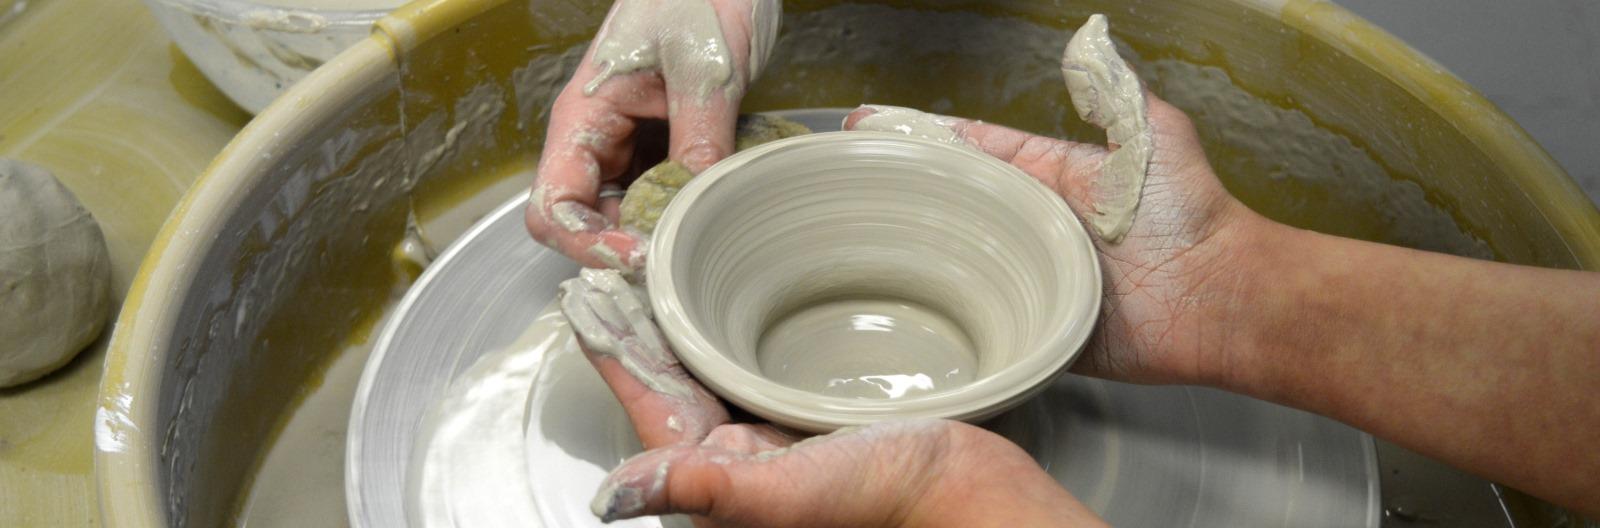 Specialist ceramics potters wheel